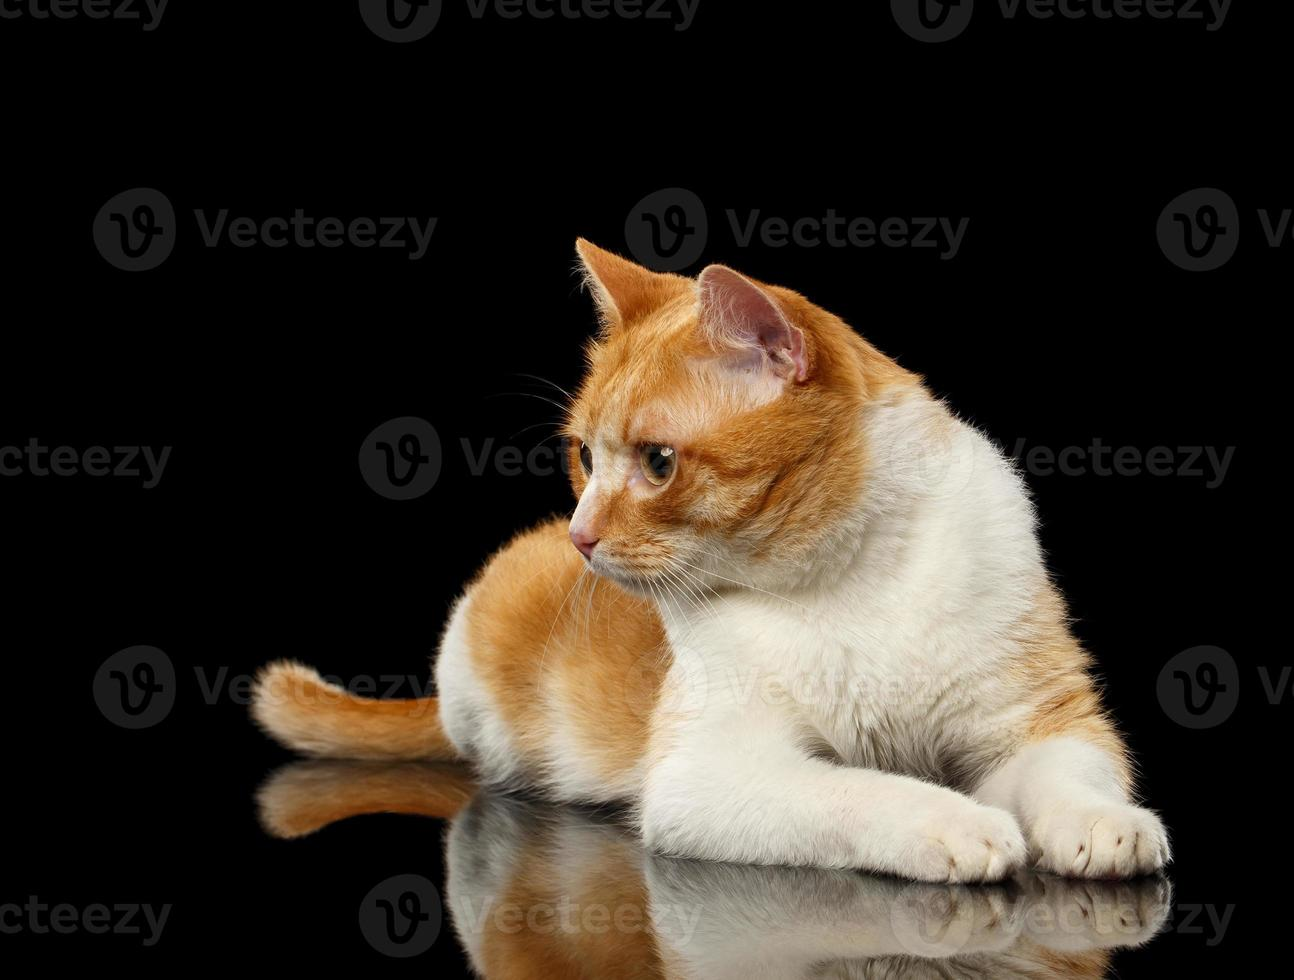 Mentira gato jengibre sorprendido mirando a la izquierda en el espejo negro foto